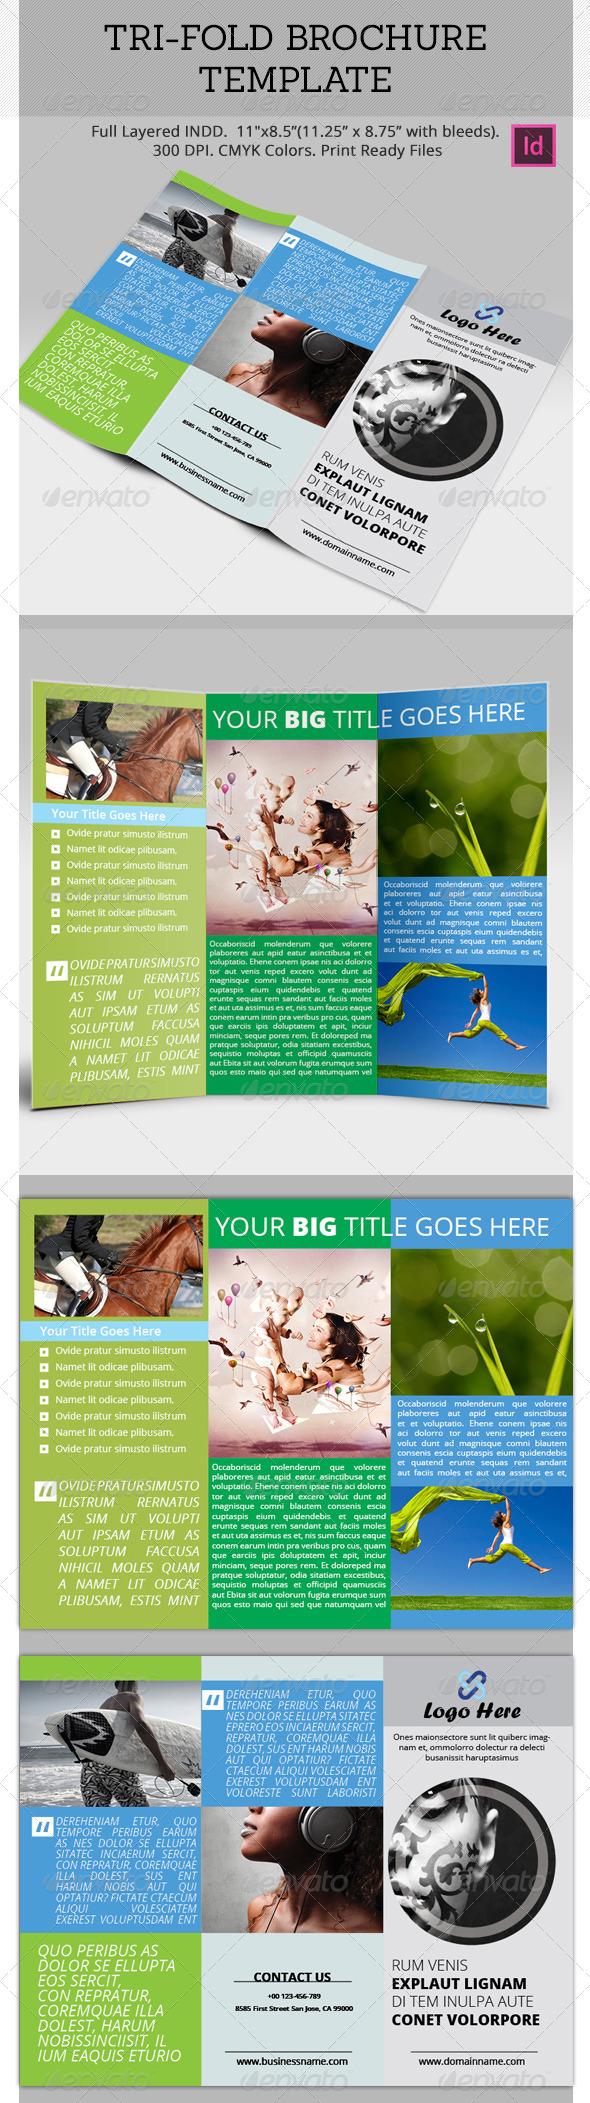 Tri-Fold Brochure Template - Brochures Print Templates